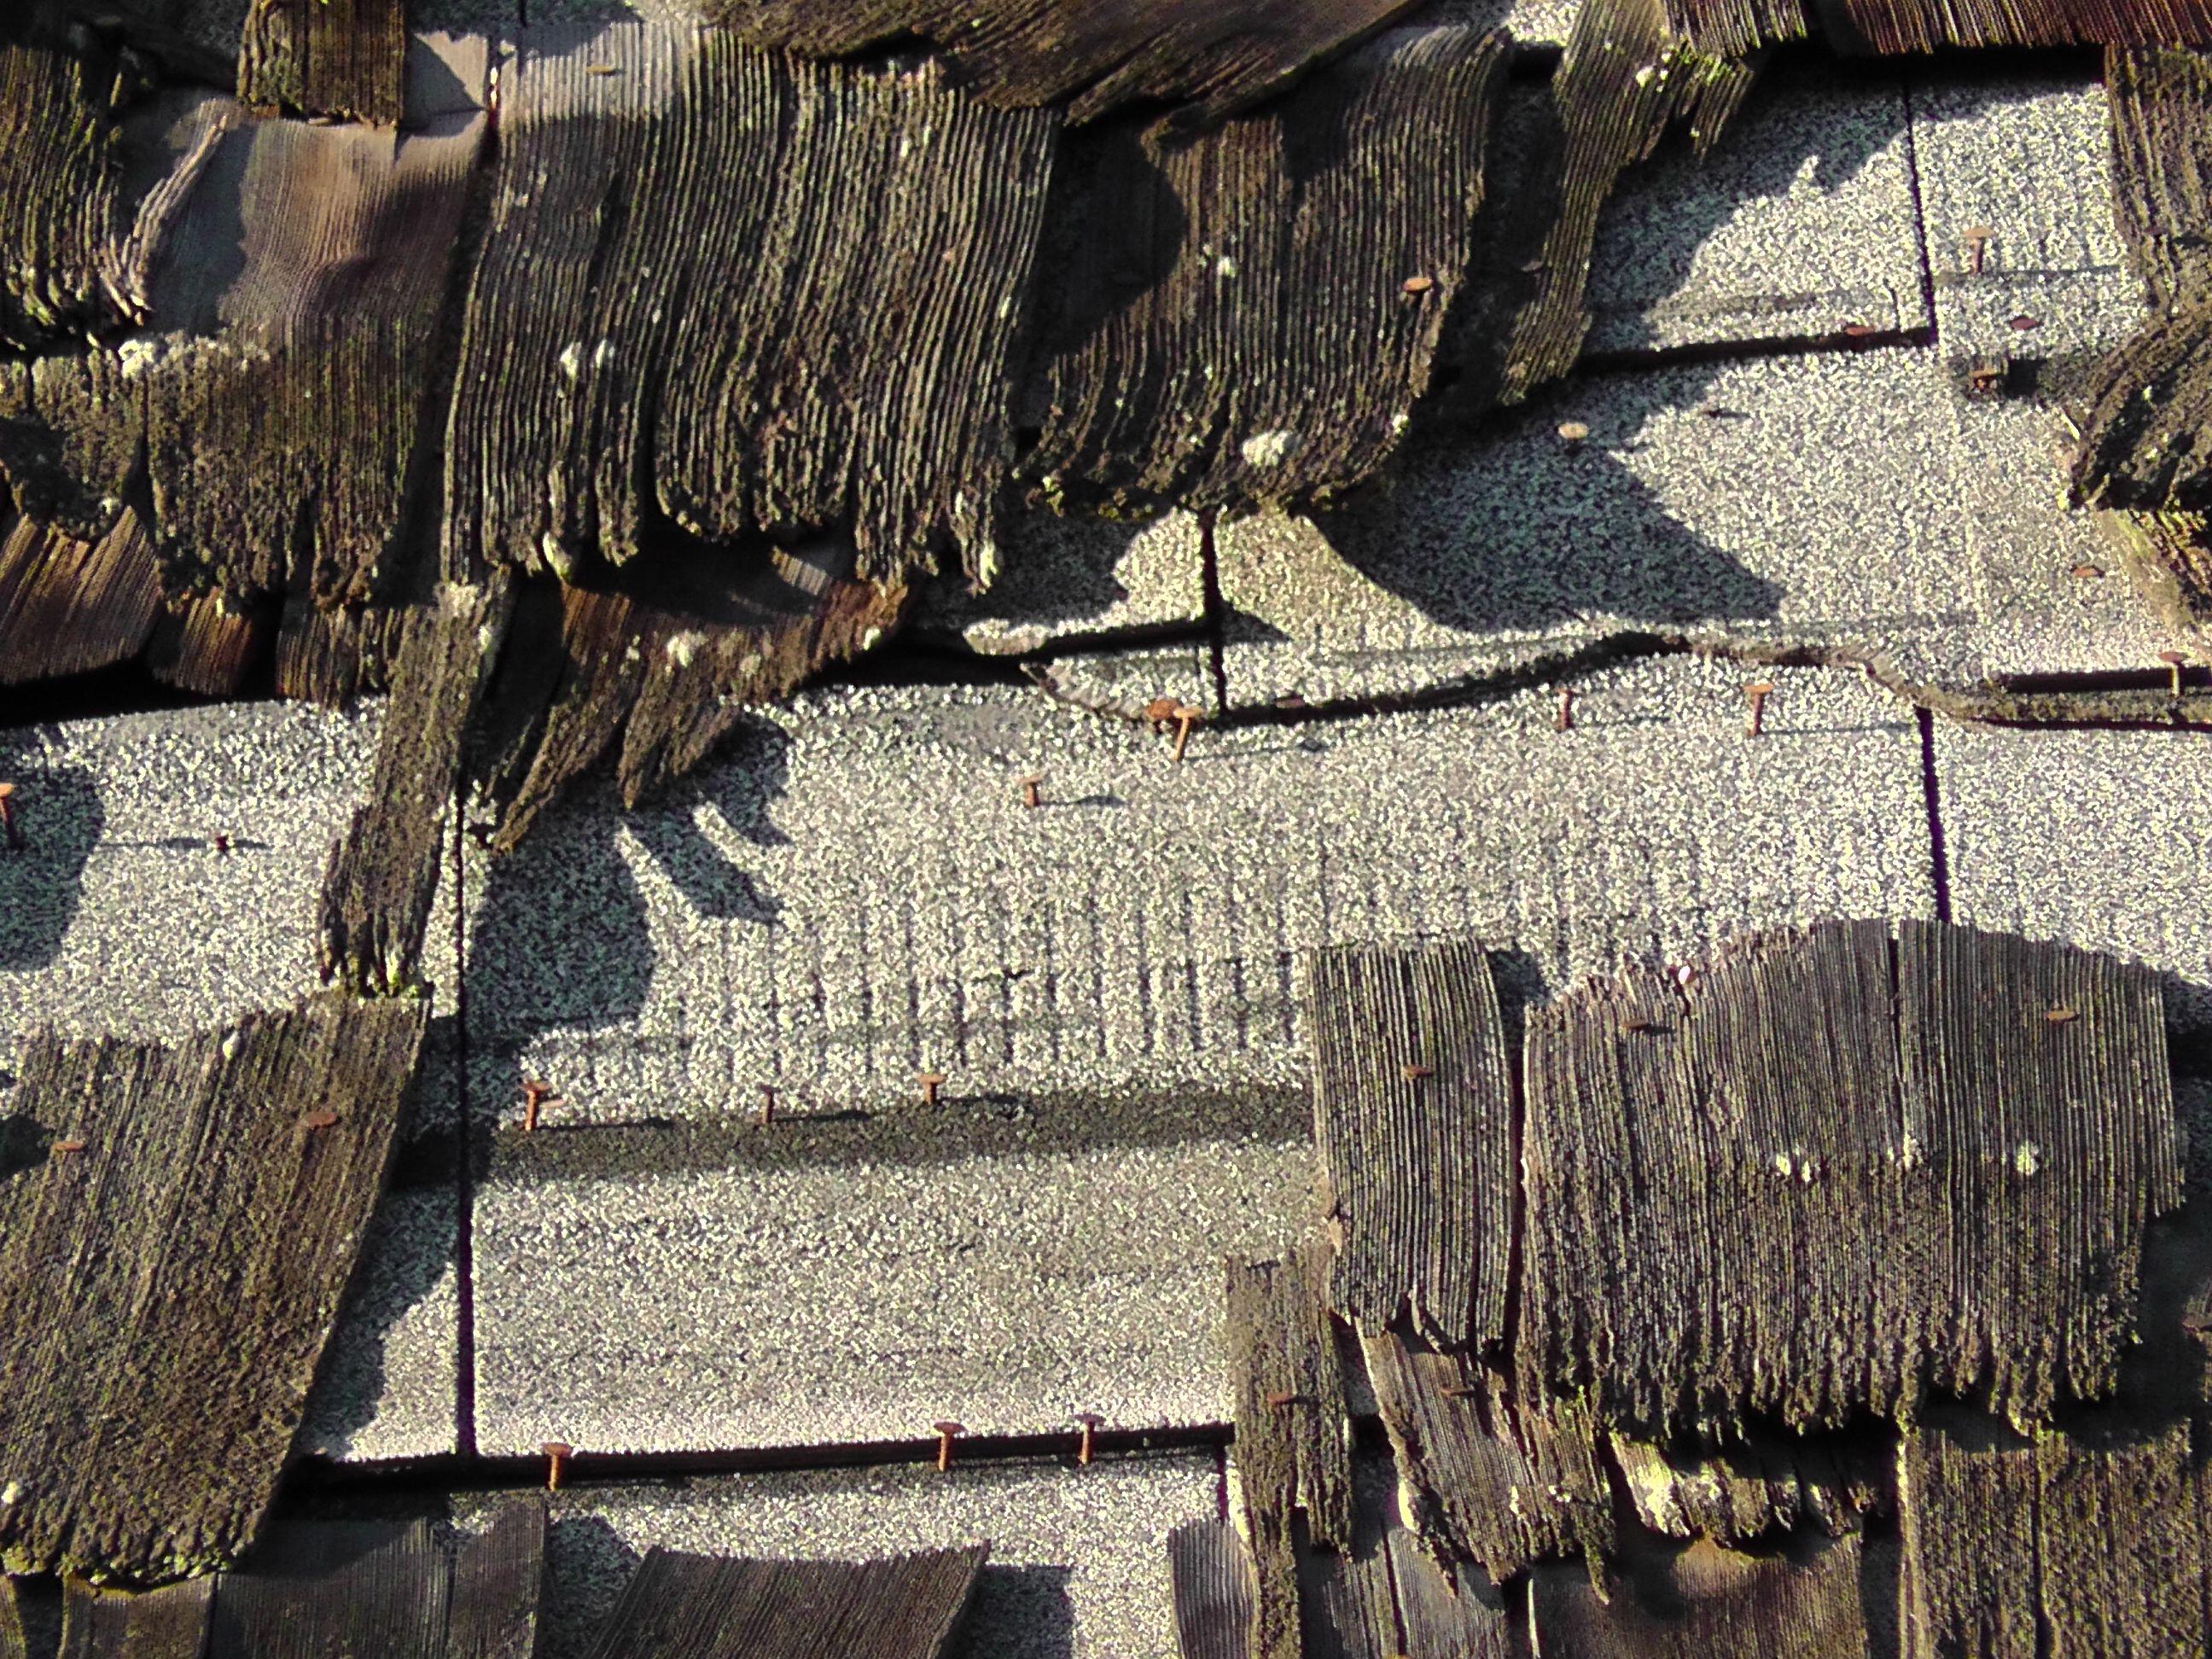 What Do Asbestos Shingles Look Like